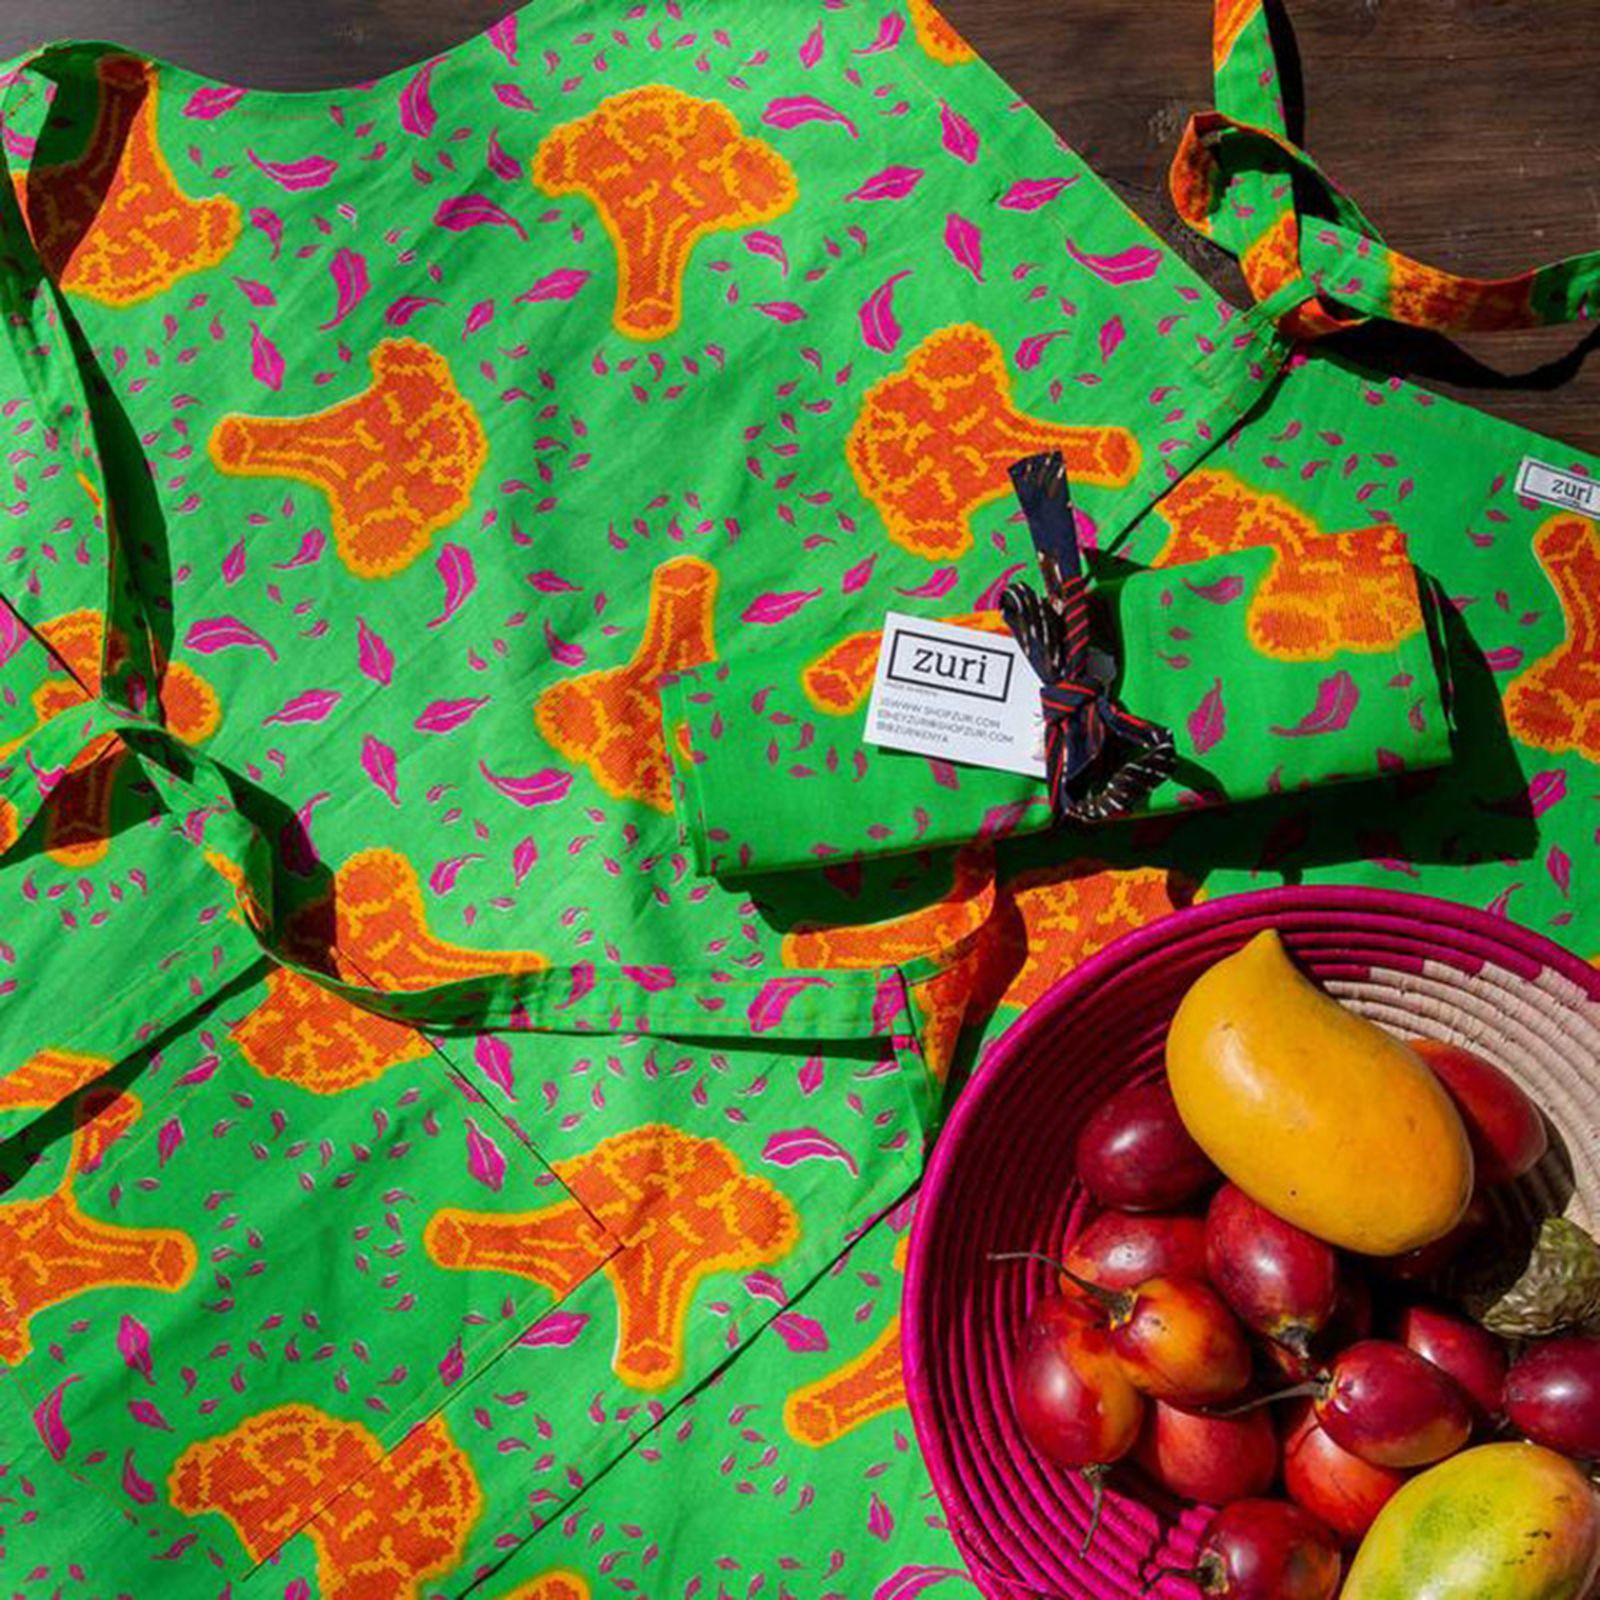 Zurikenya / Dress and Cooking Bundle